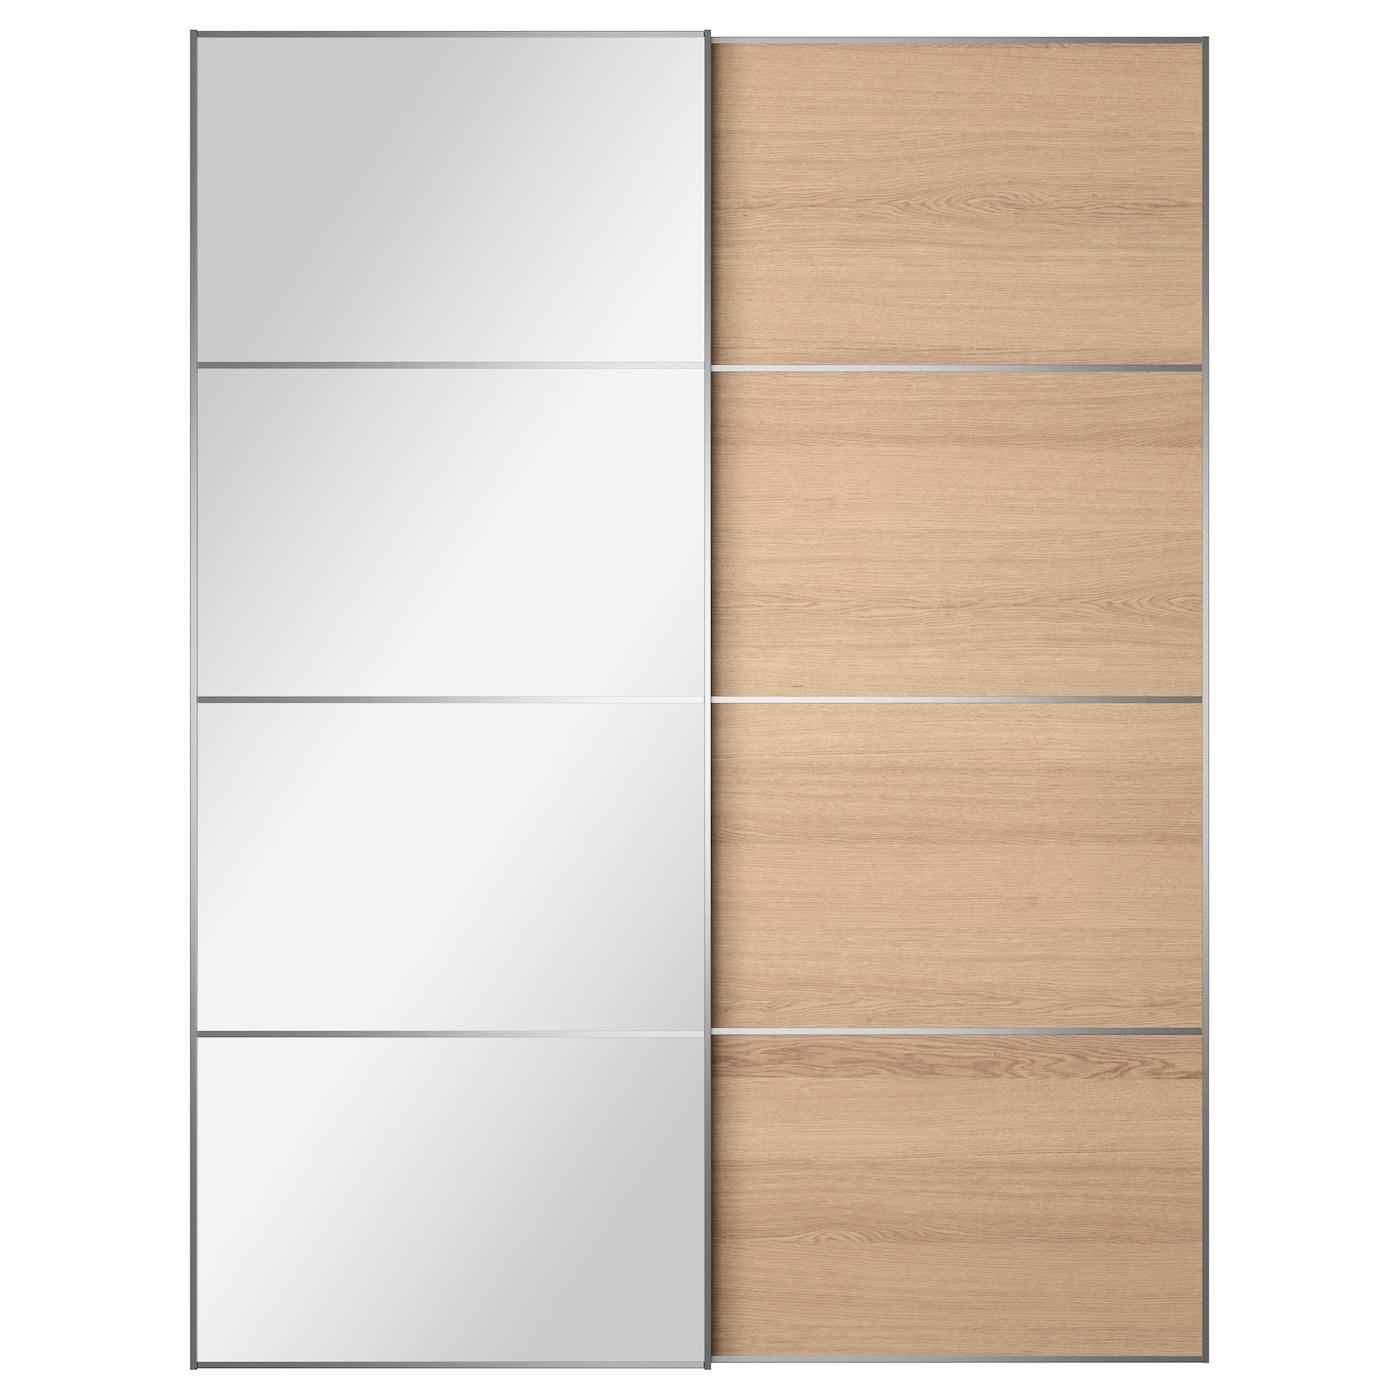 AULI / ILSENG, Schiebetürpaar, Spiegelglas, 599.302.89